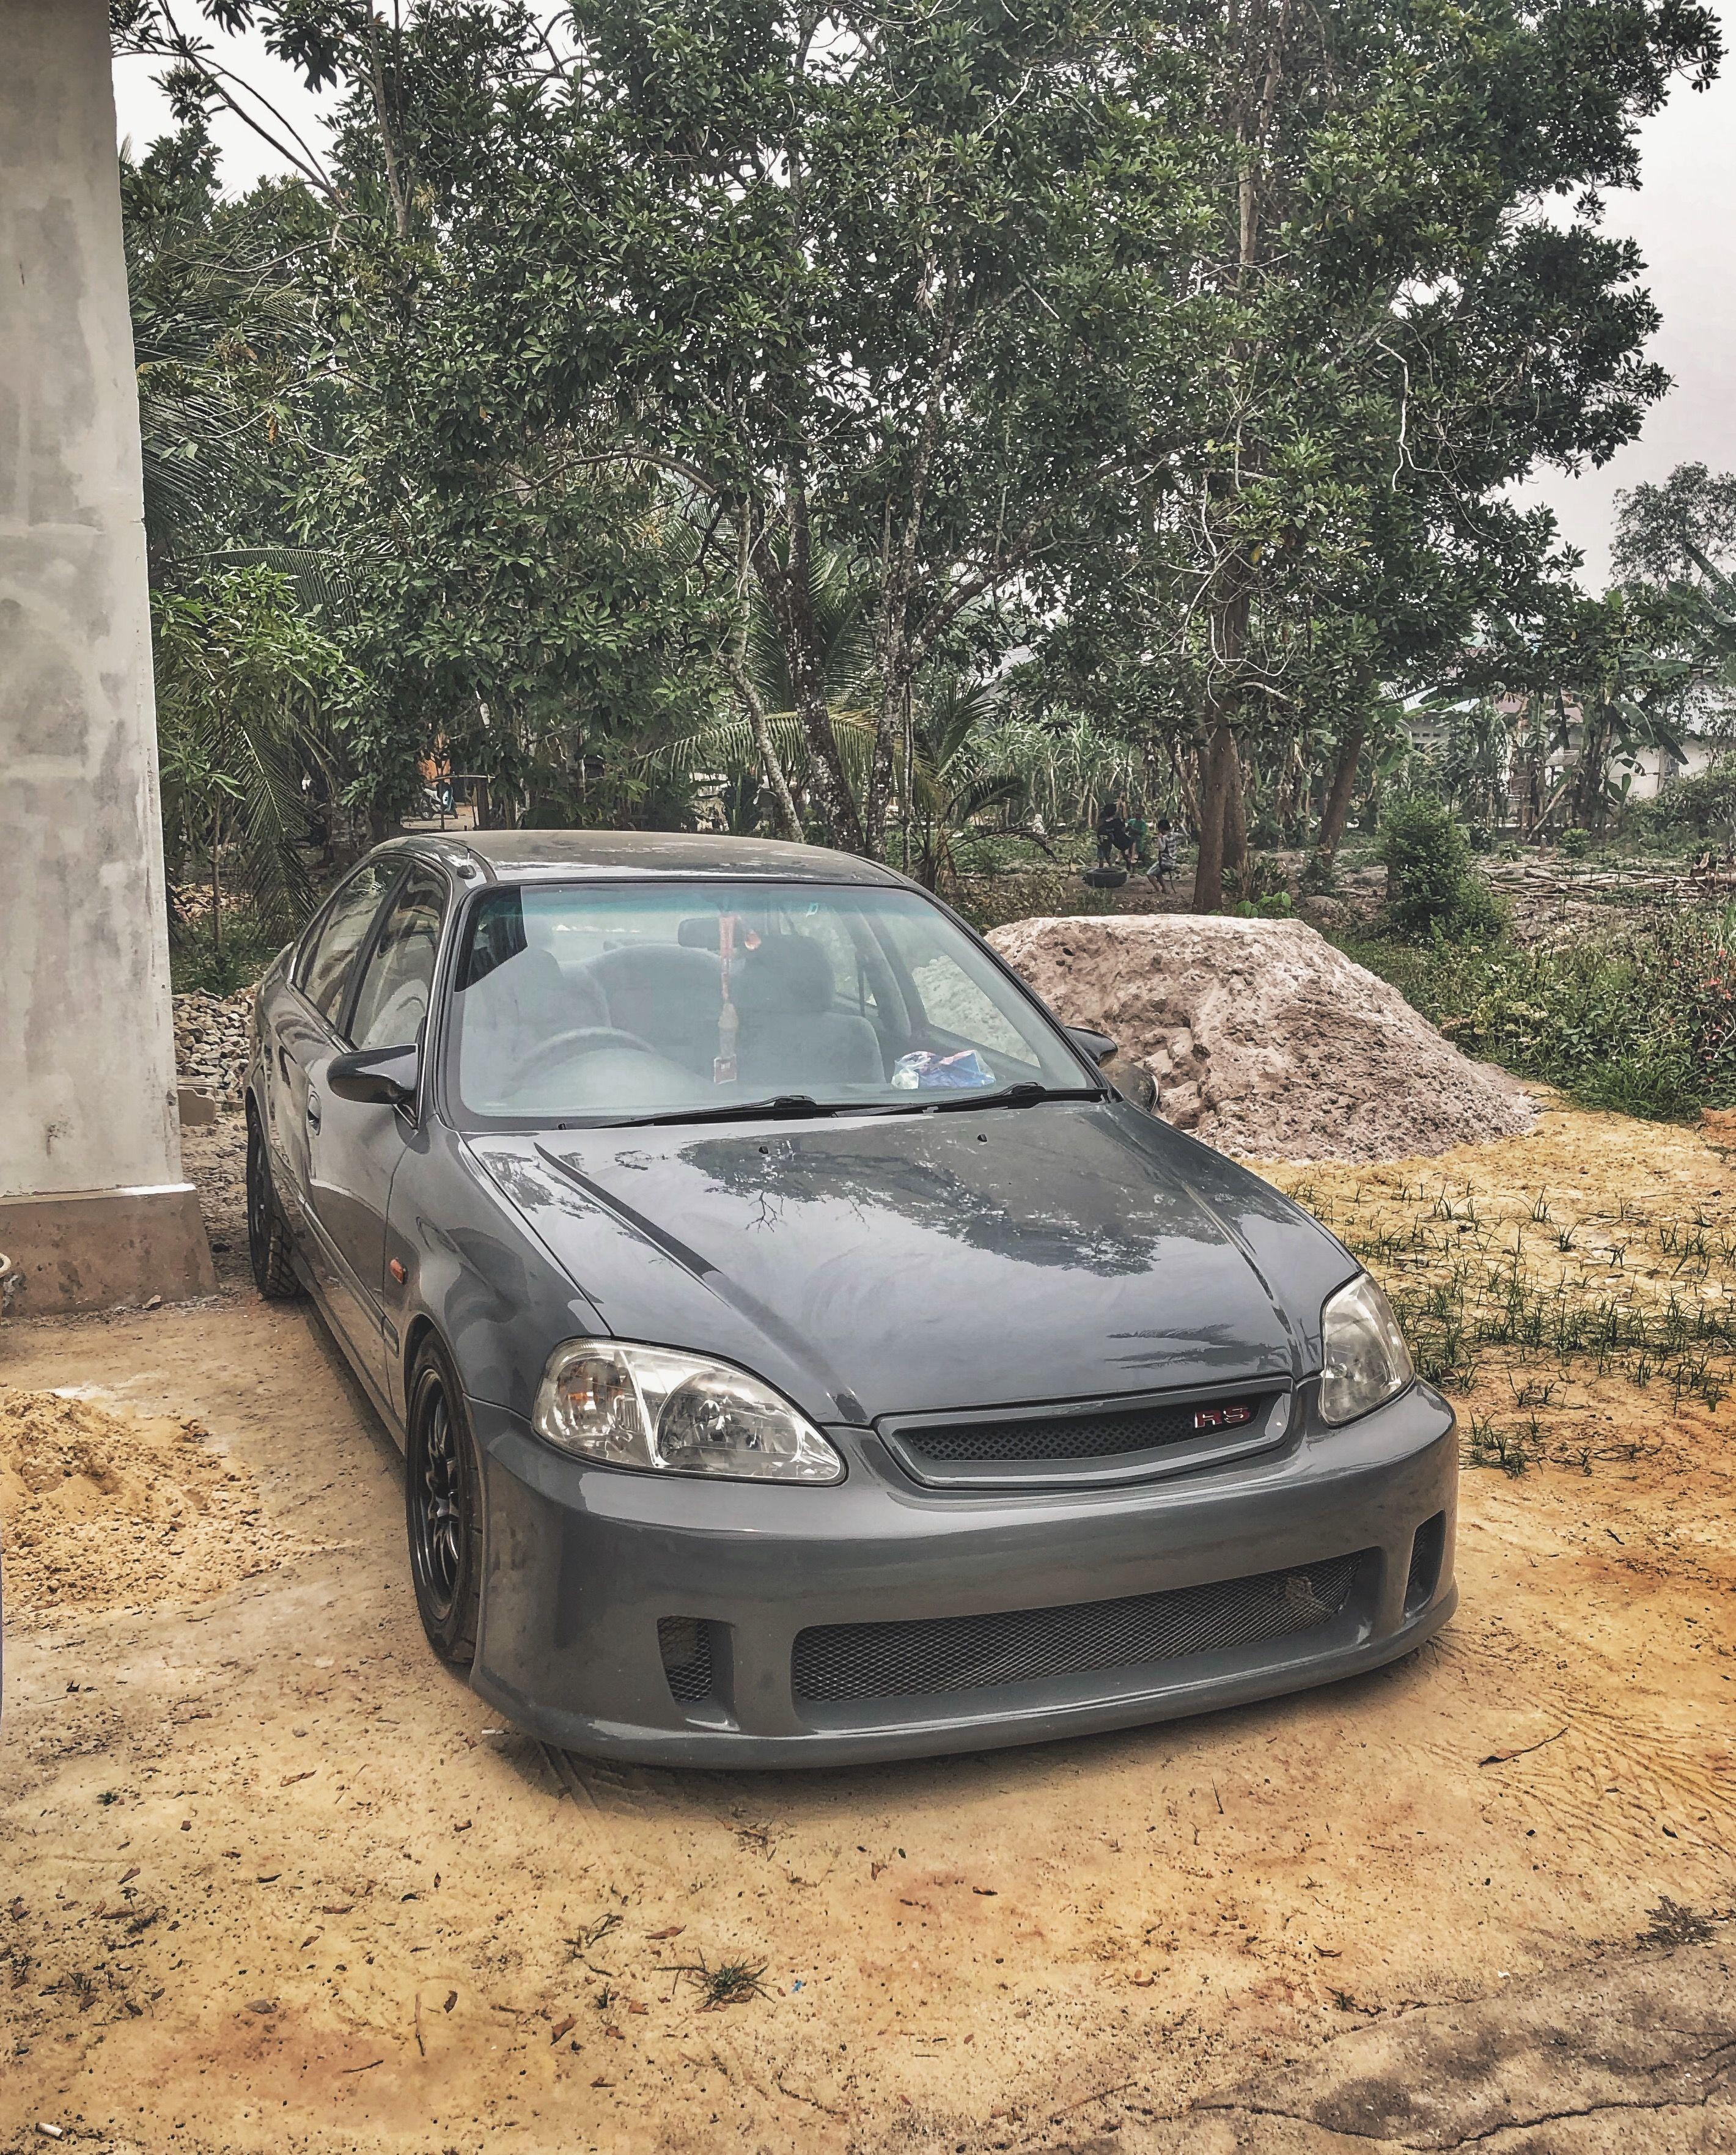 Civic Ferio A K A Civic Ek 4d A K A So4 Honda Civic Nardo Grey Civic